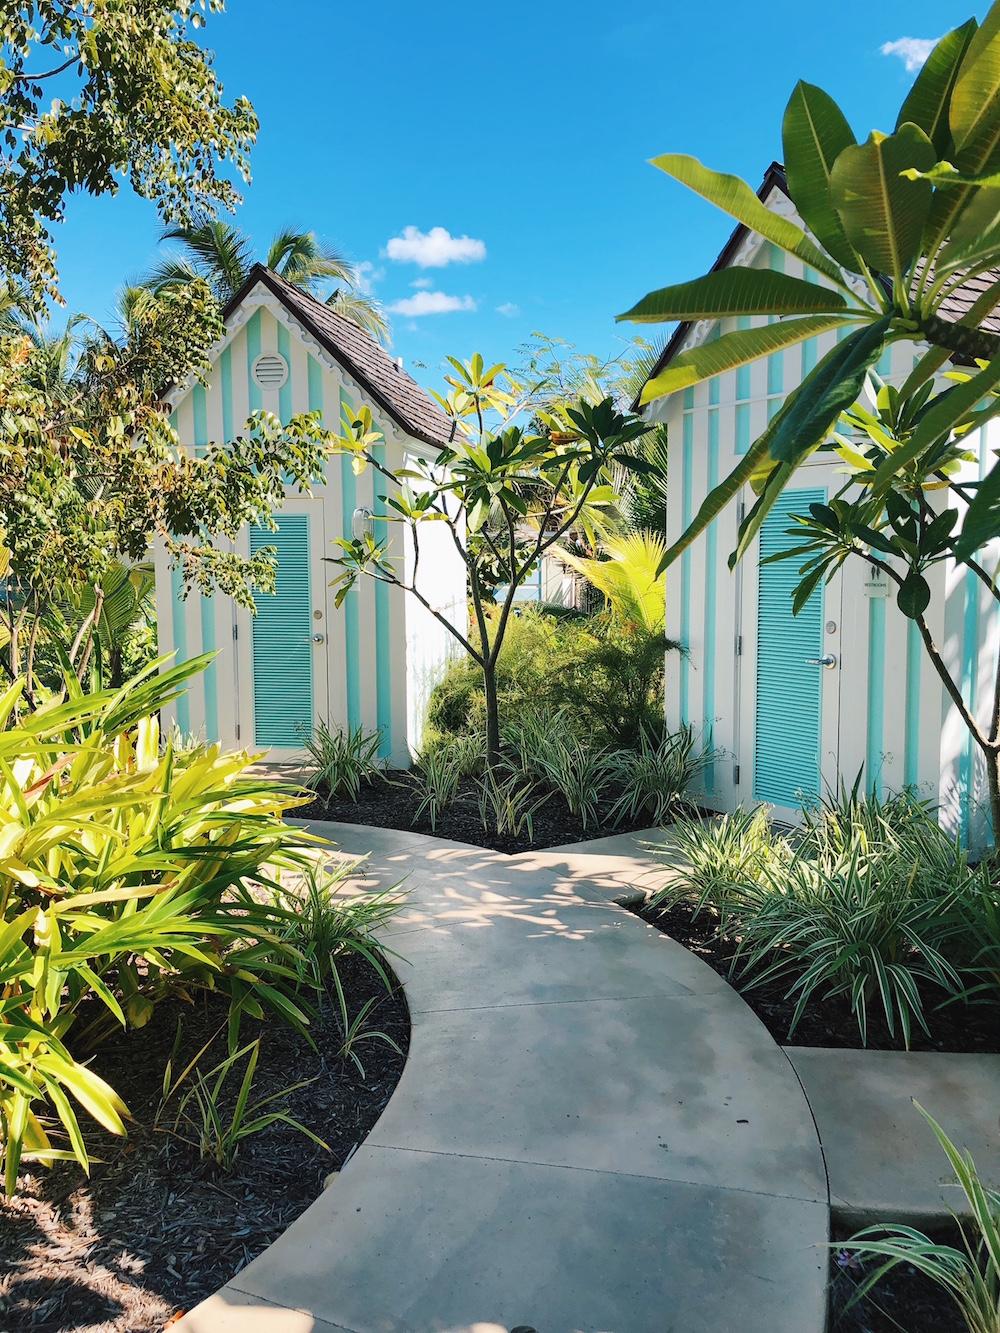 Pool bathroom shacks at Grand Hyatt Baha Mar Bahamas